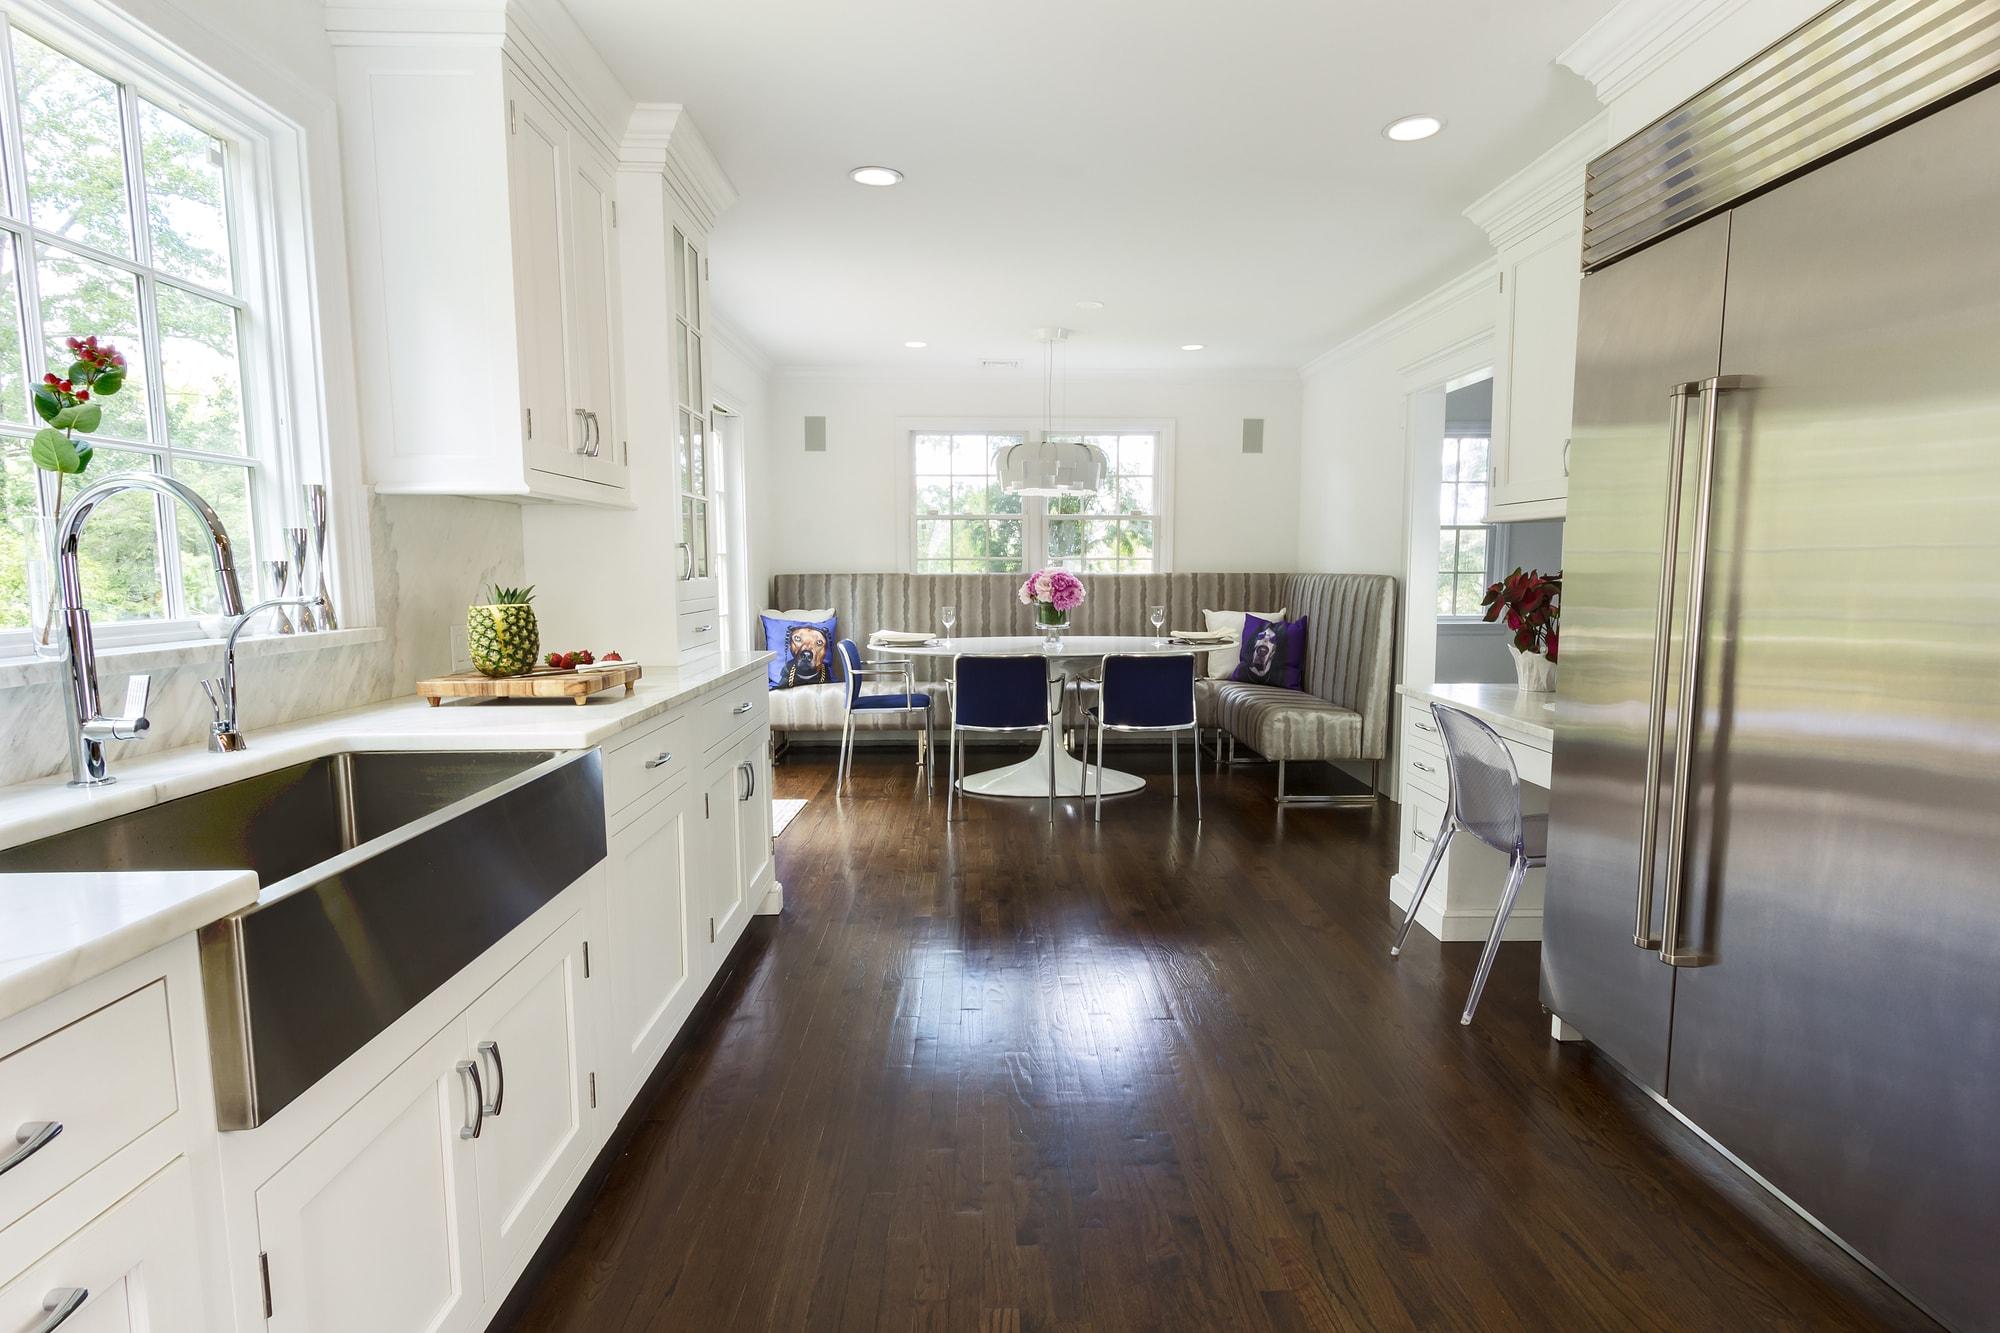 Transitional style kitchen with hardwood floor